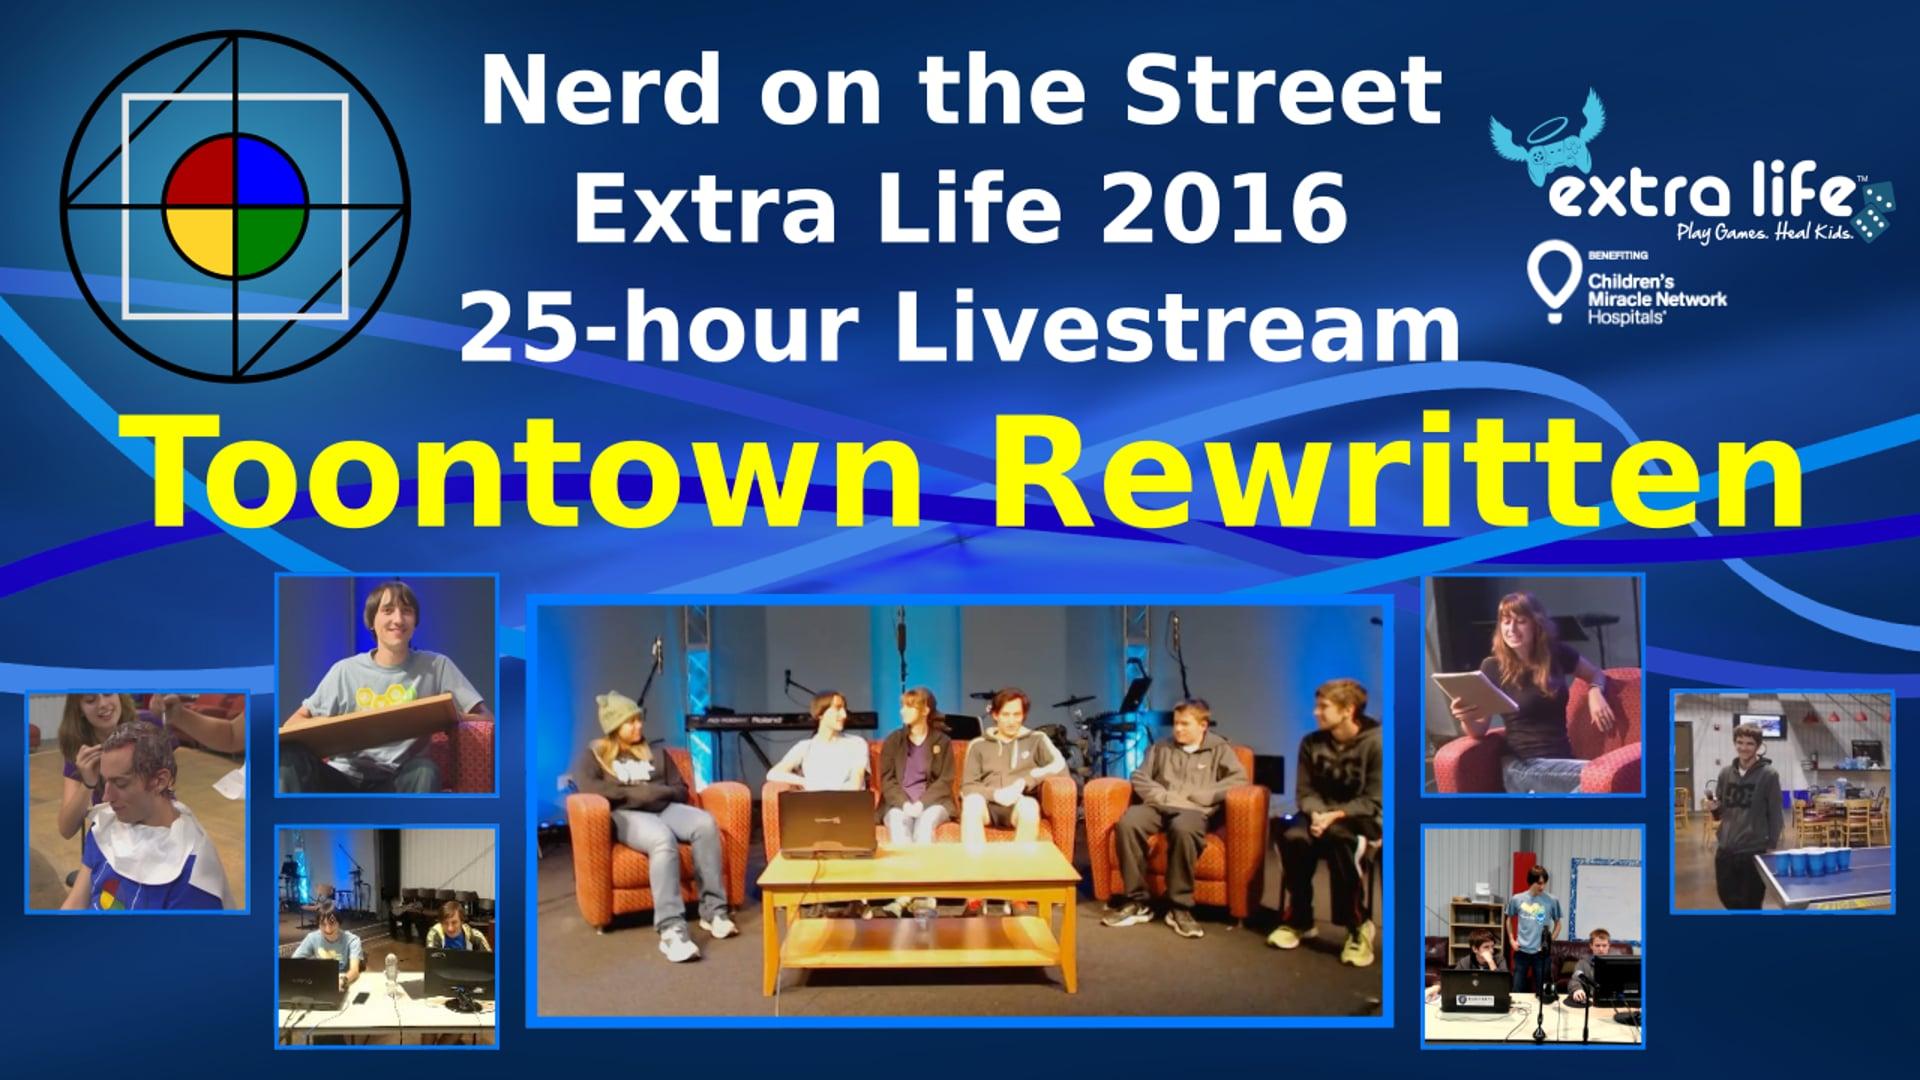 Toontown Rewritten - Extra Life 2016